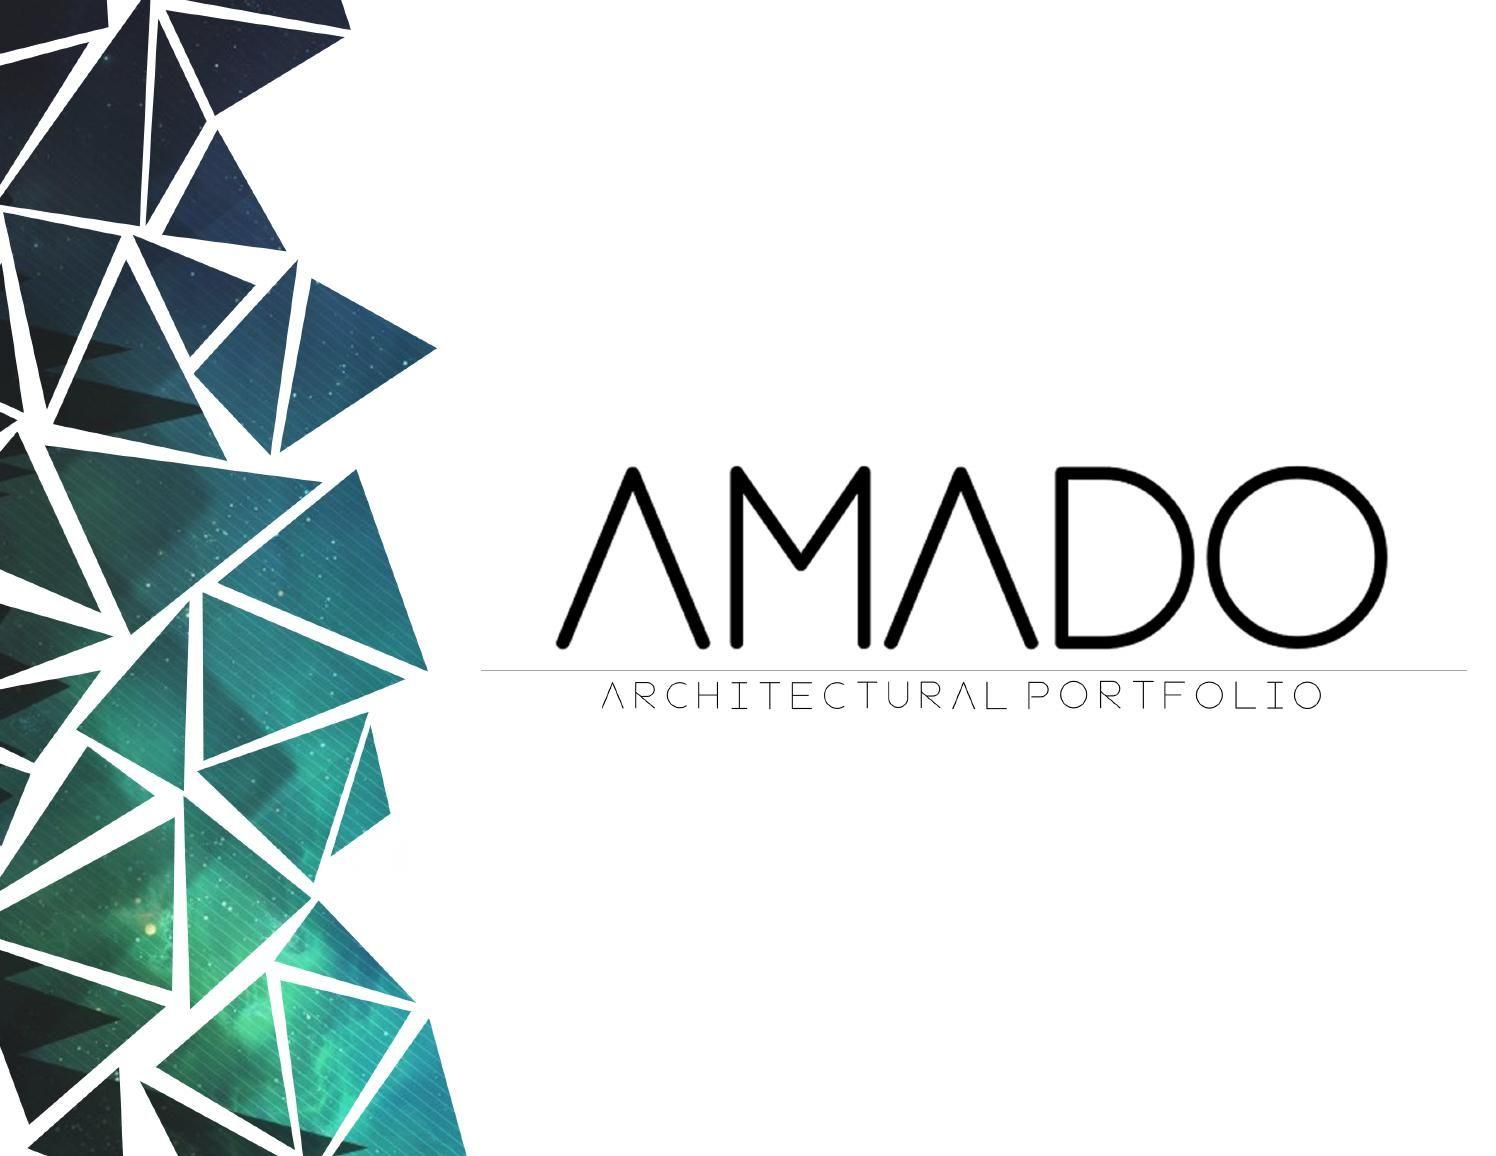 Amado ortiz architecture portfolio architecture for Architectural portfolio ideas